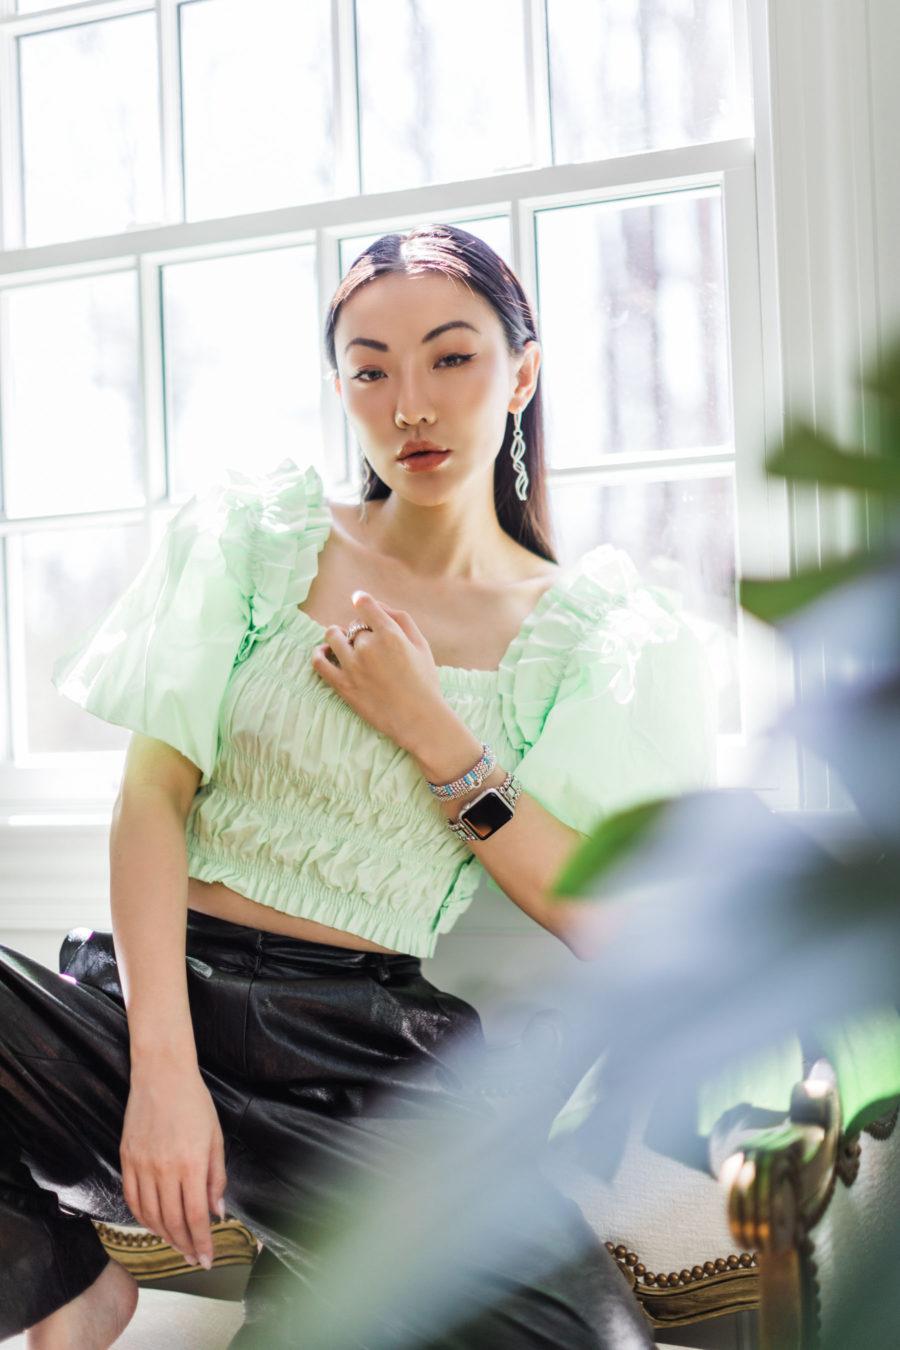 jessica wang wearing a luxury apple watch band by lagos jewelry brand // Jessica Wang - Notjessfashion.com